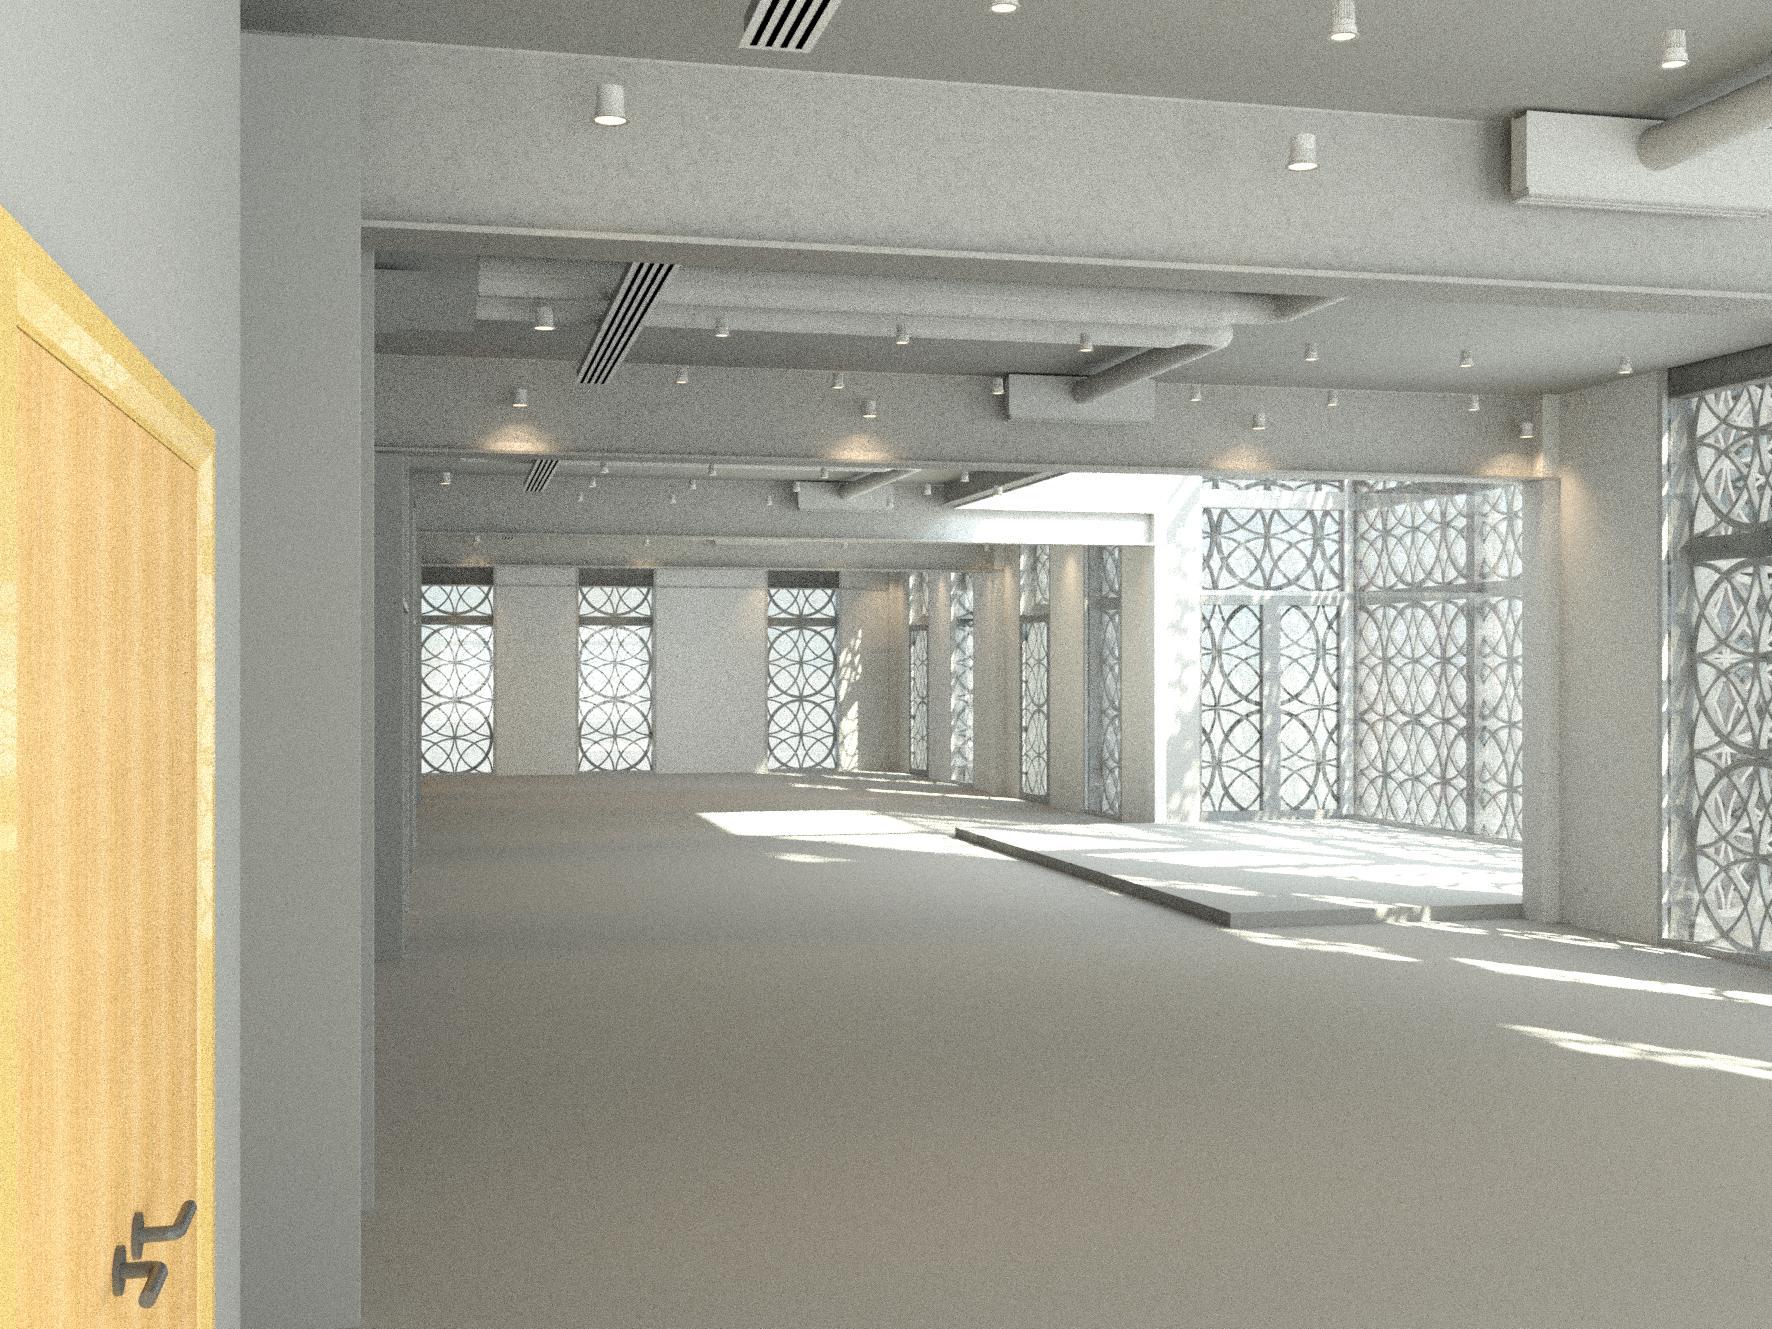 3878-ground-floor-image2-2